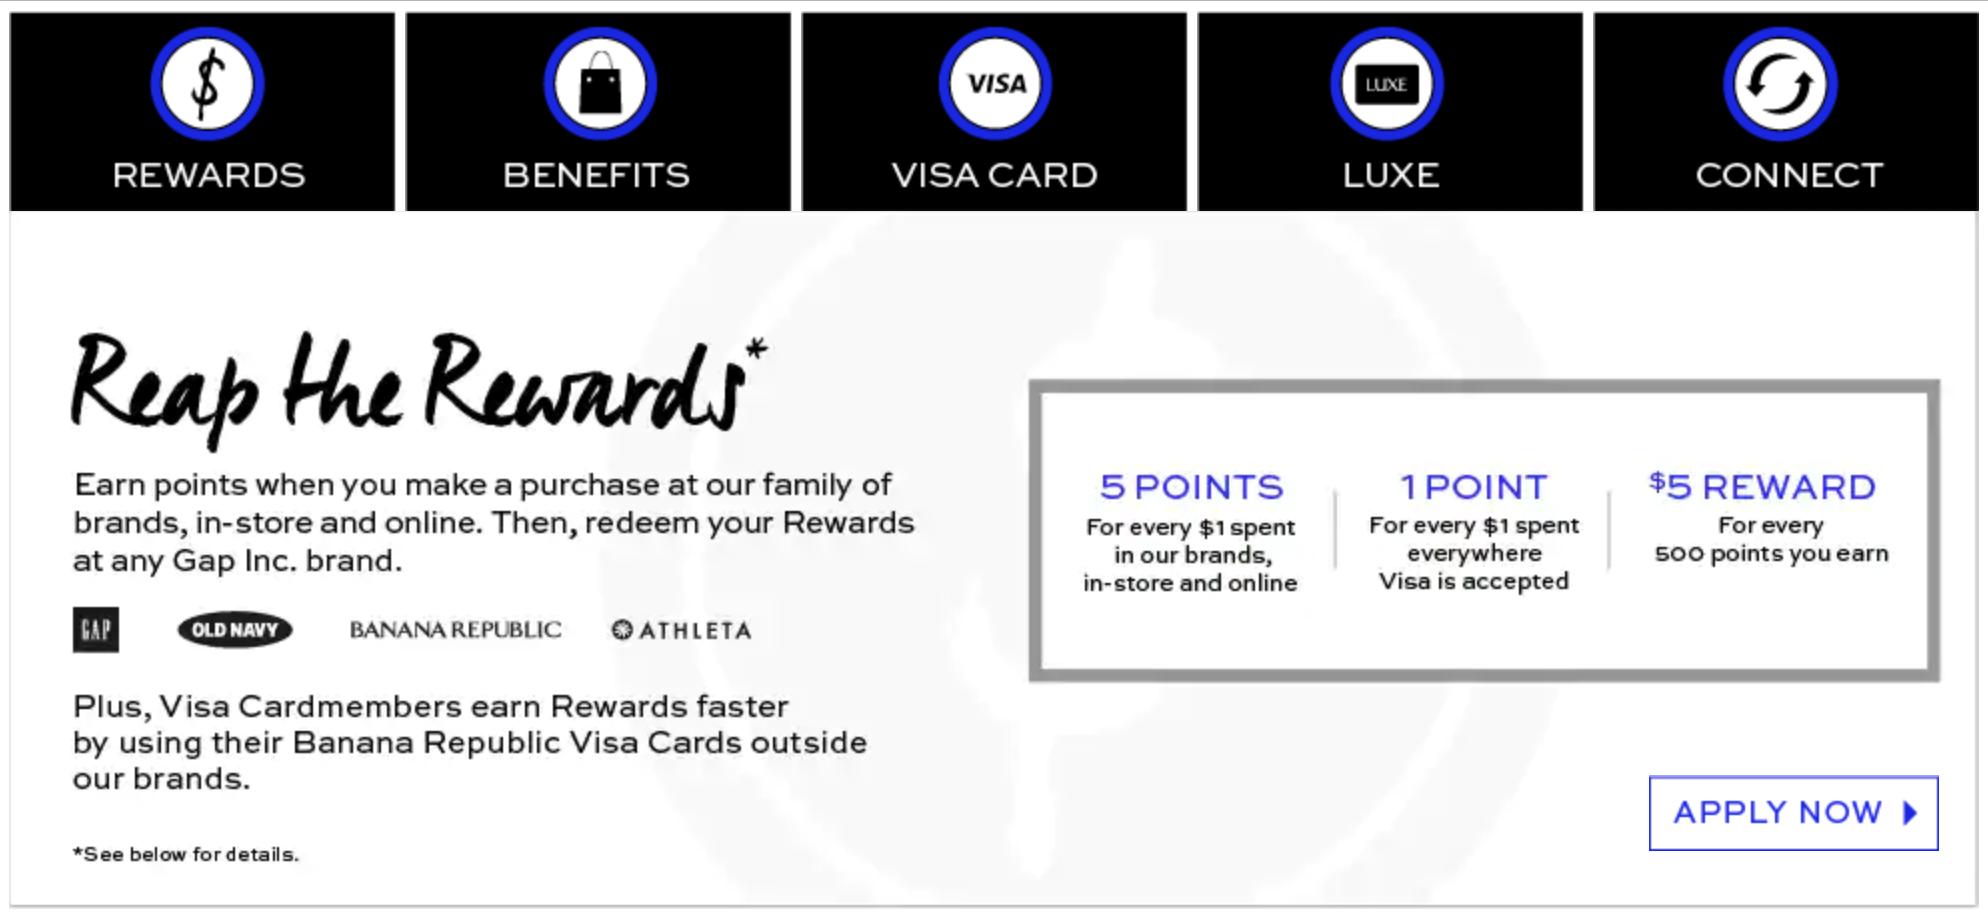 Banana Republic Credit Cards & Rewards Program - Worth It? [2018]